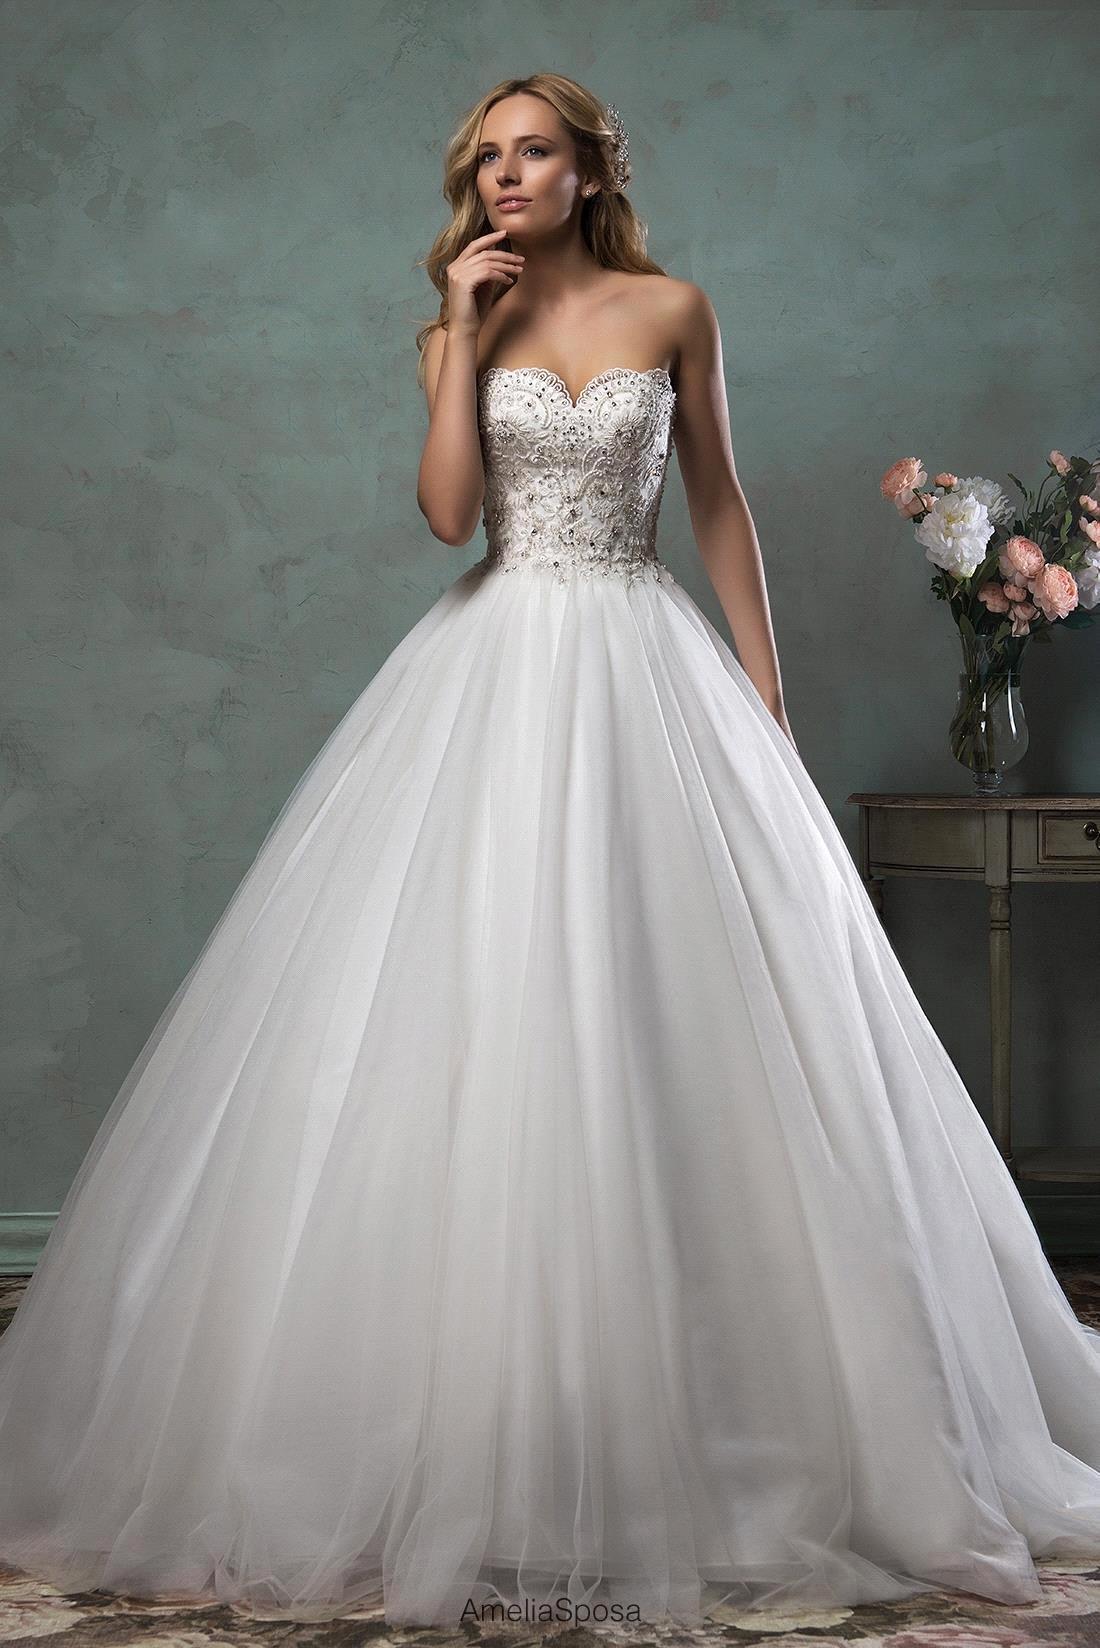 Romantic Luxury Vestido De Noiva Princess Appliques Beads Top Wedding  Dresses 2017 Bridal Ball Gown Wedding Dress With Big Train-in Wedding  Dresses from ... 73edf5bff71a